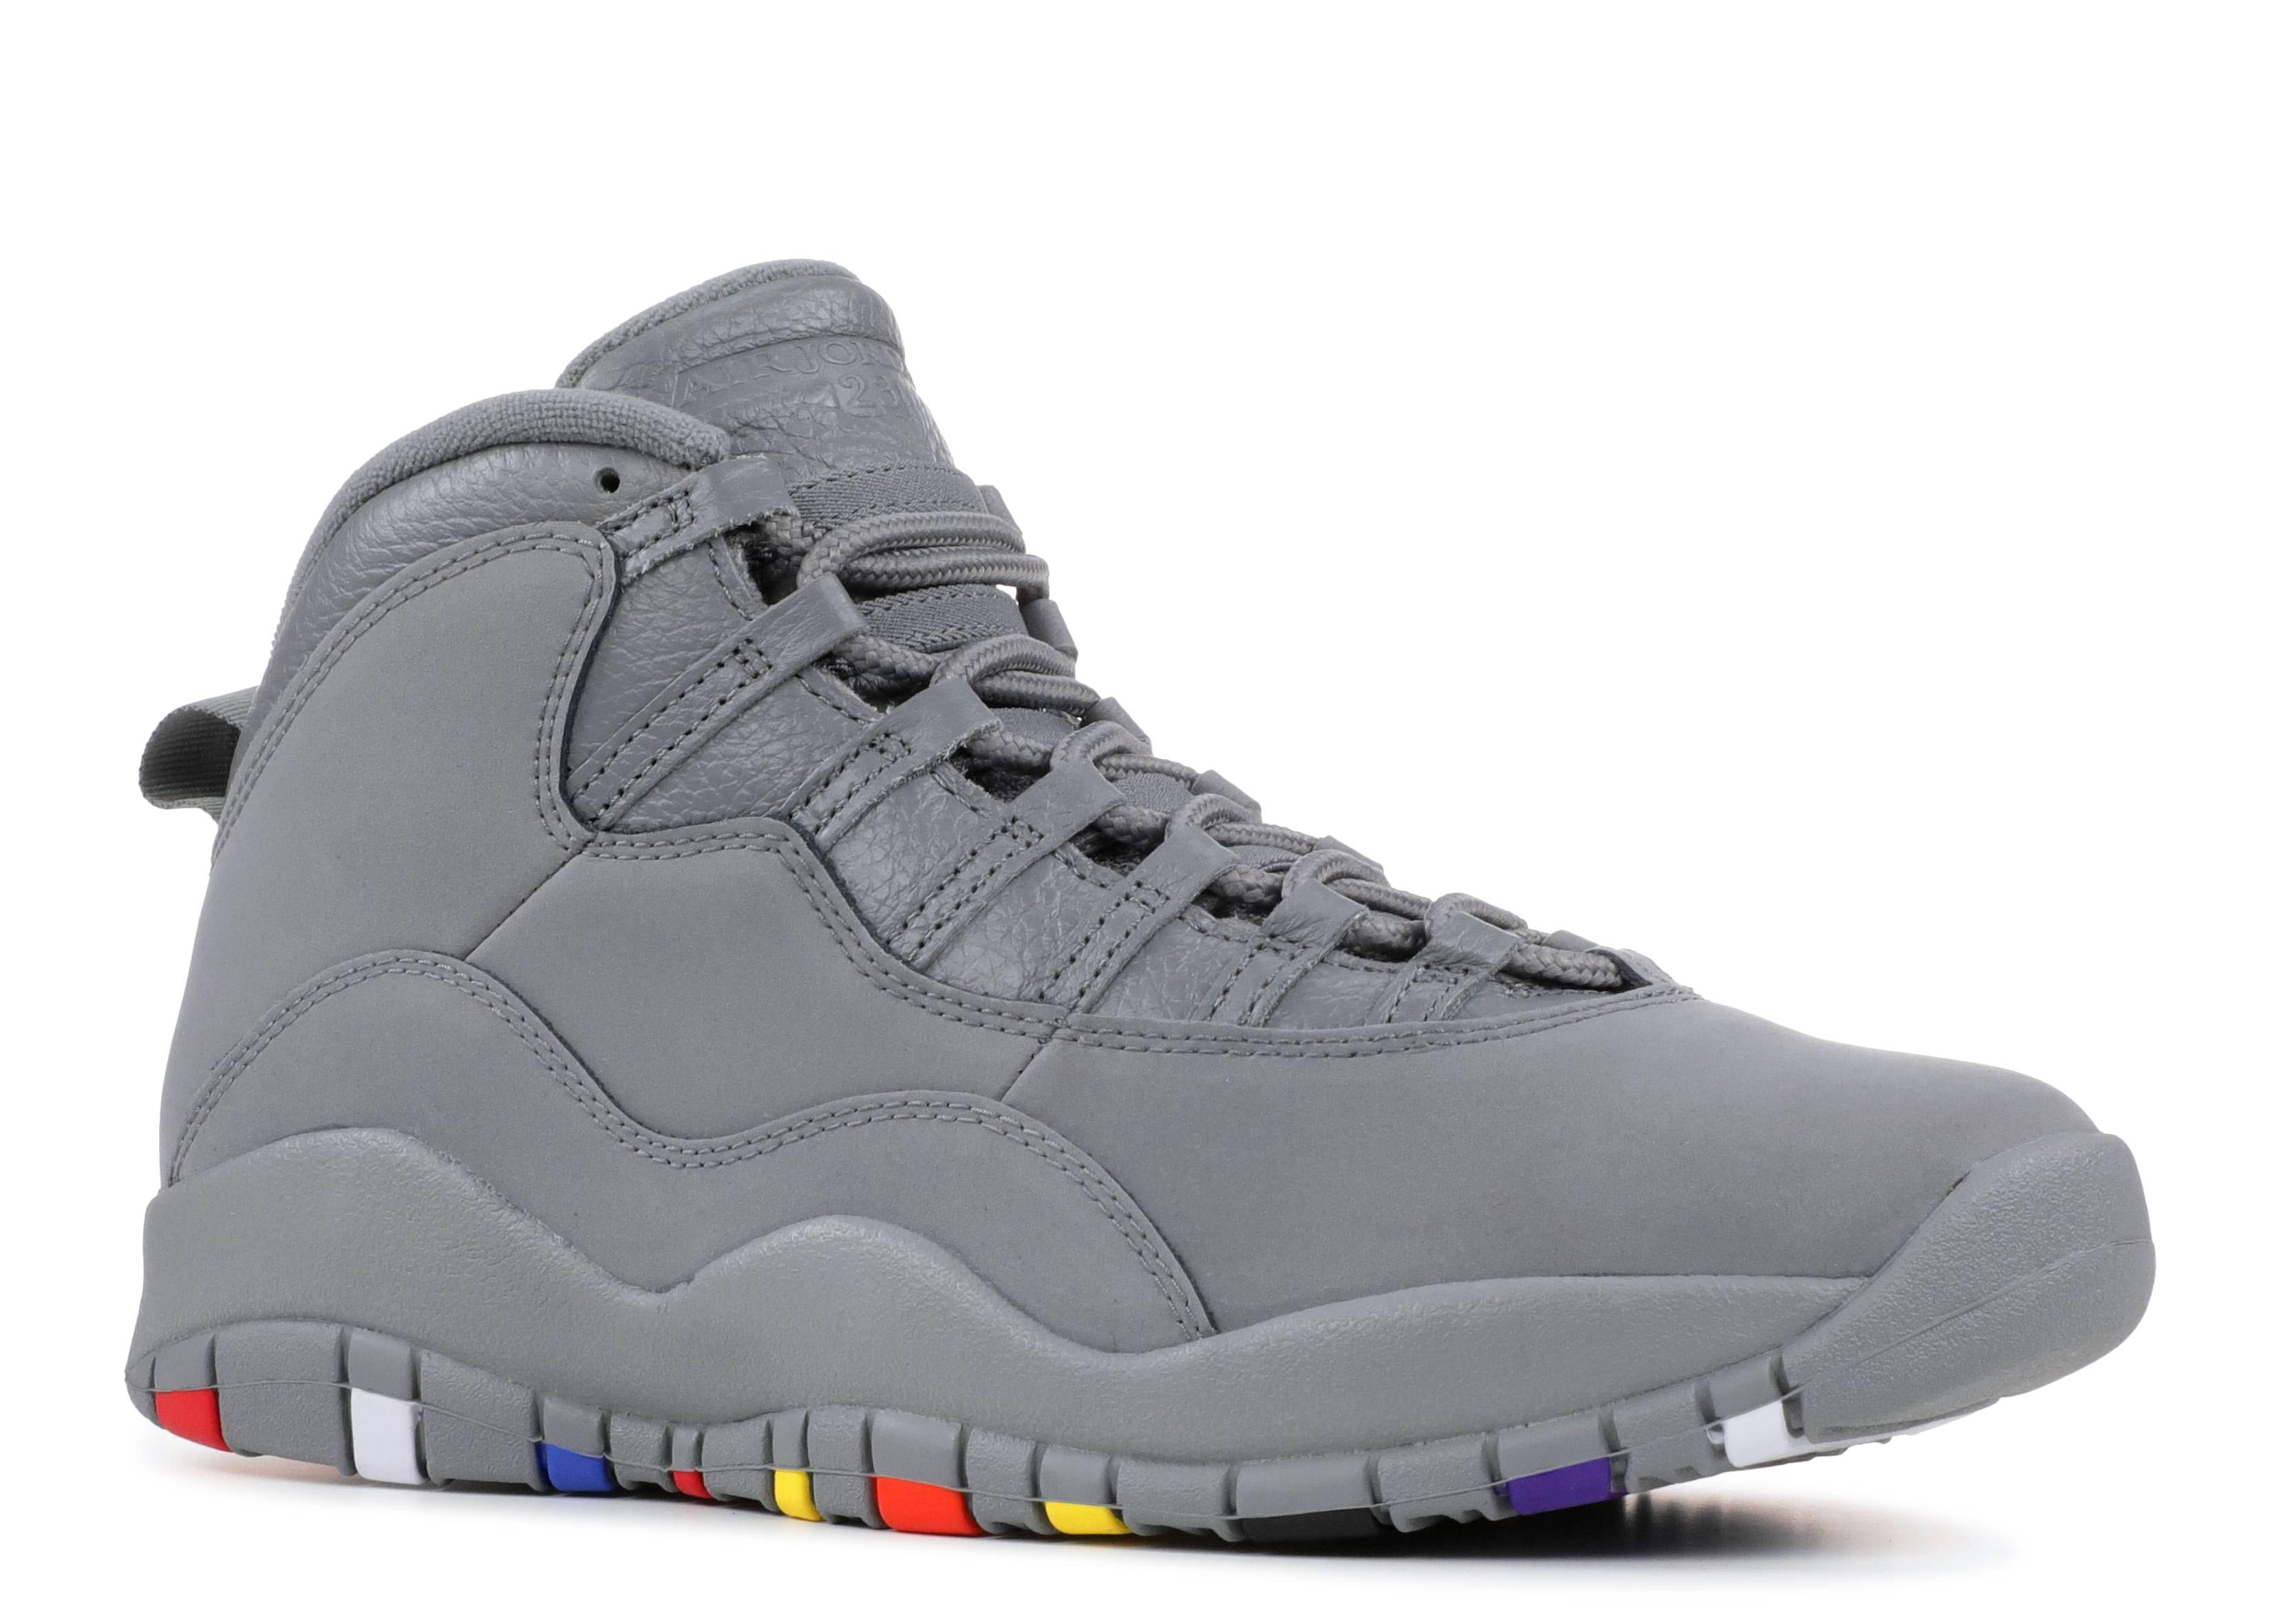 c871fcd69eec italy fly sneakers the jordan ultra.fly sneakers 903fc 855cb  free shipping  air jordan 10 retro cool fd5f4 97b03